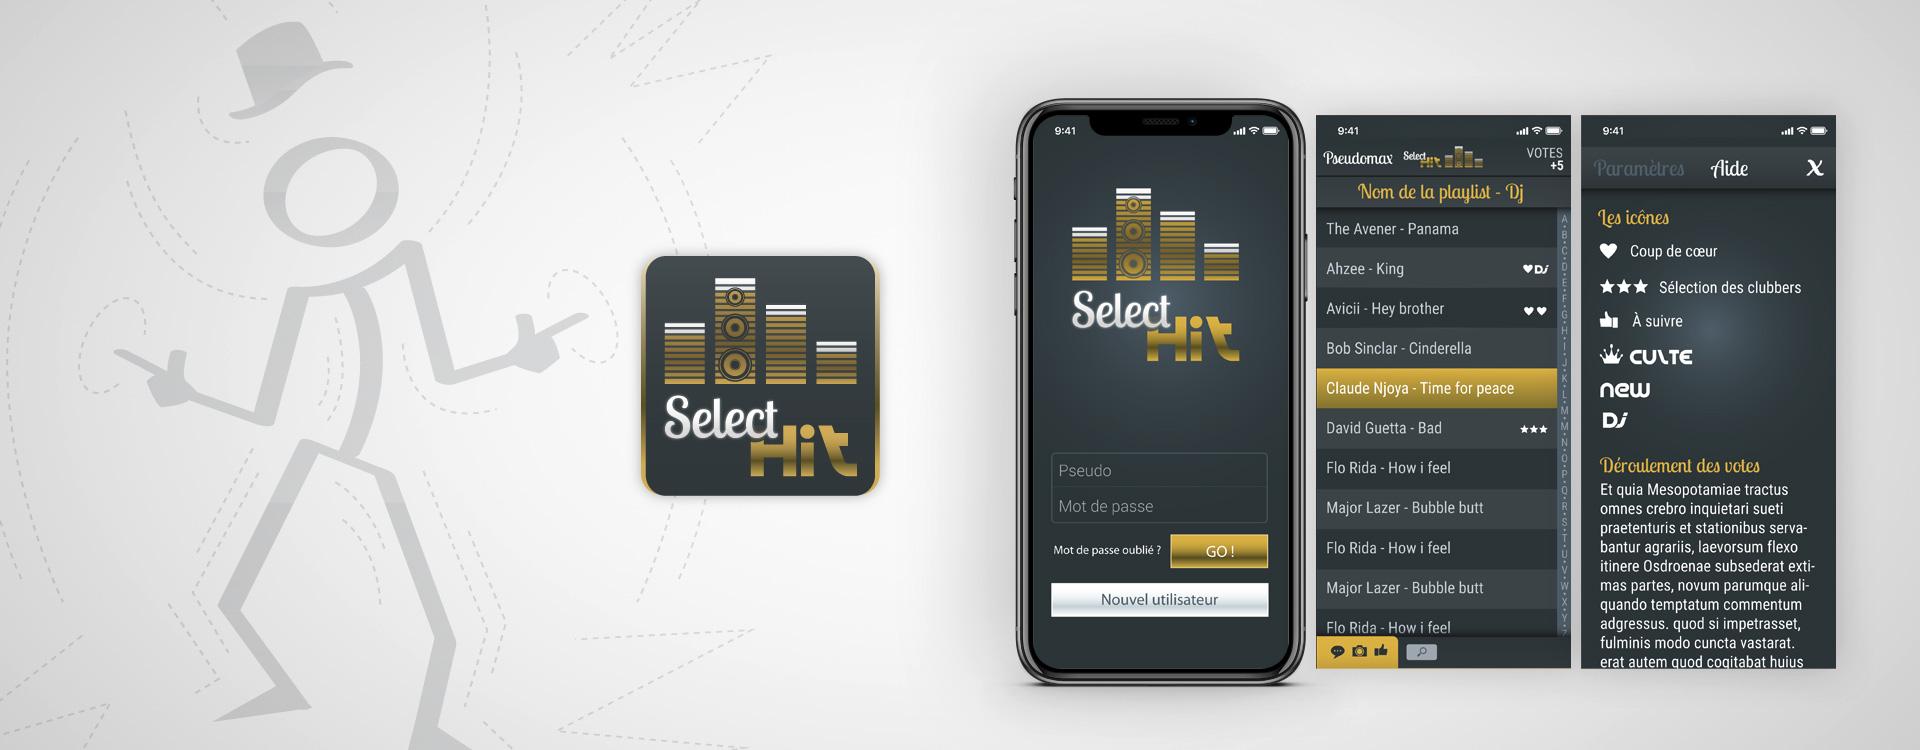 selectHit-1